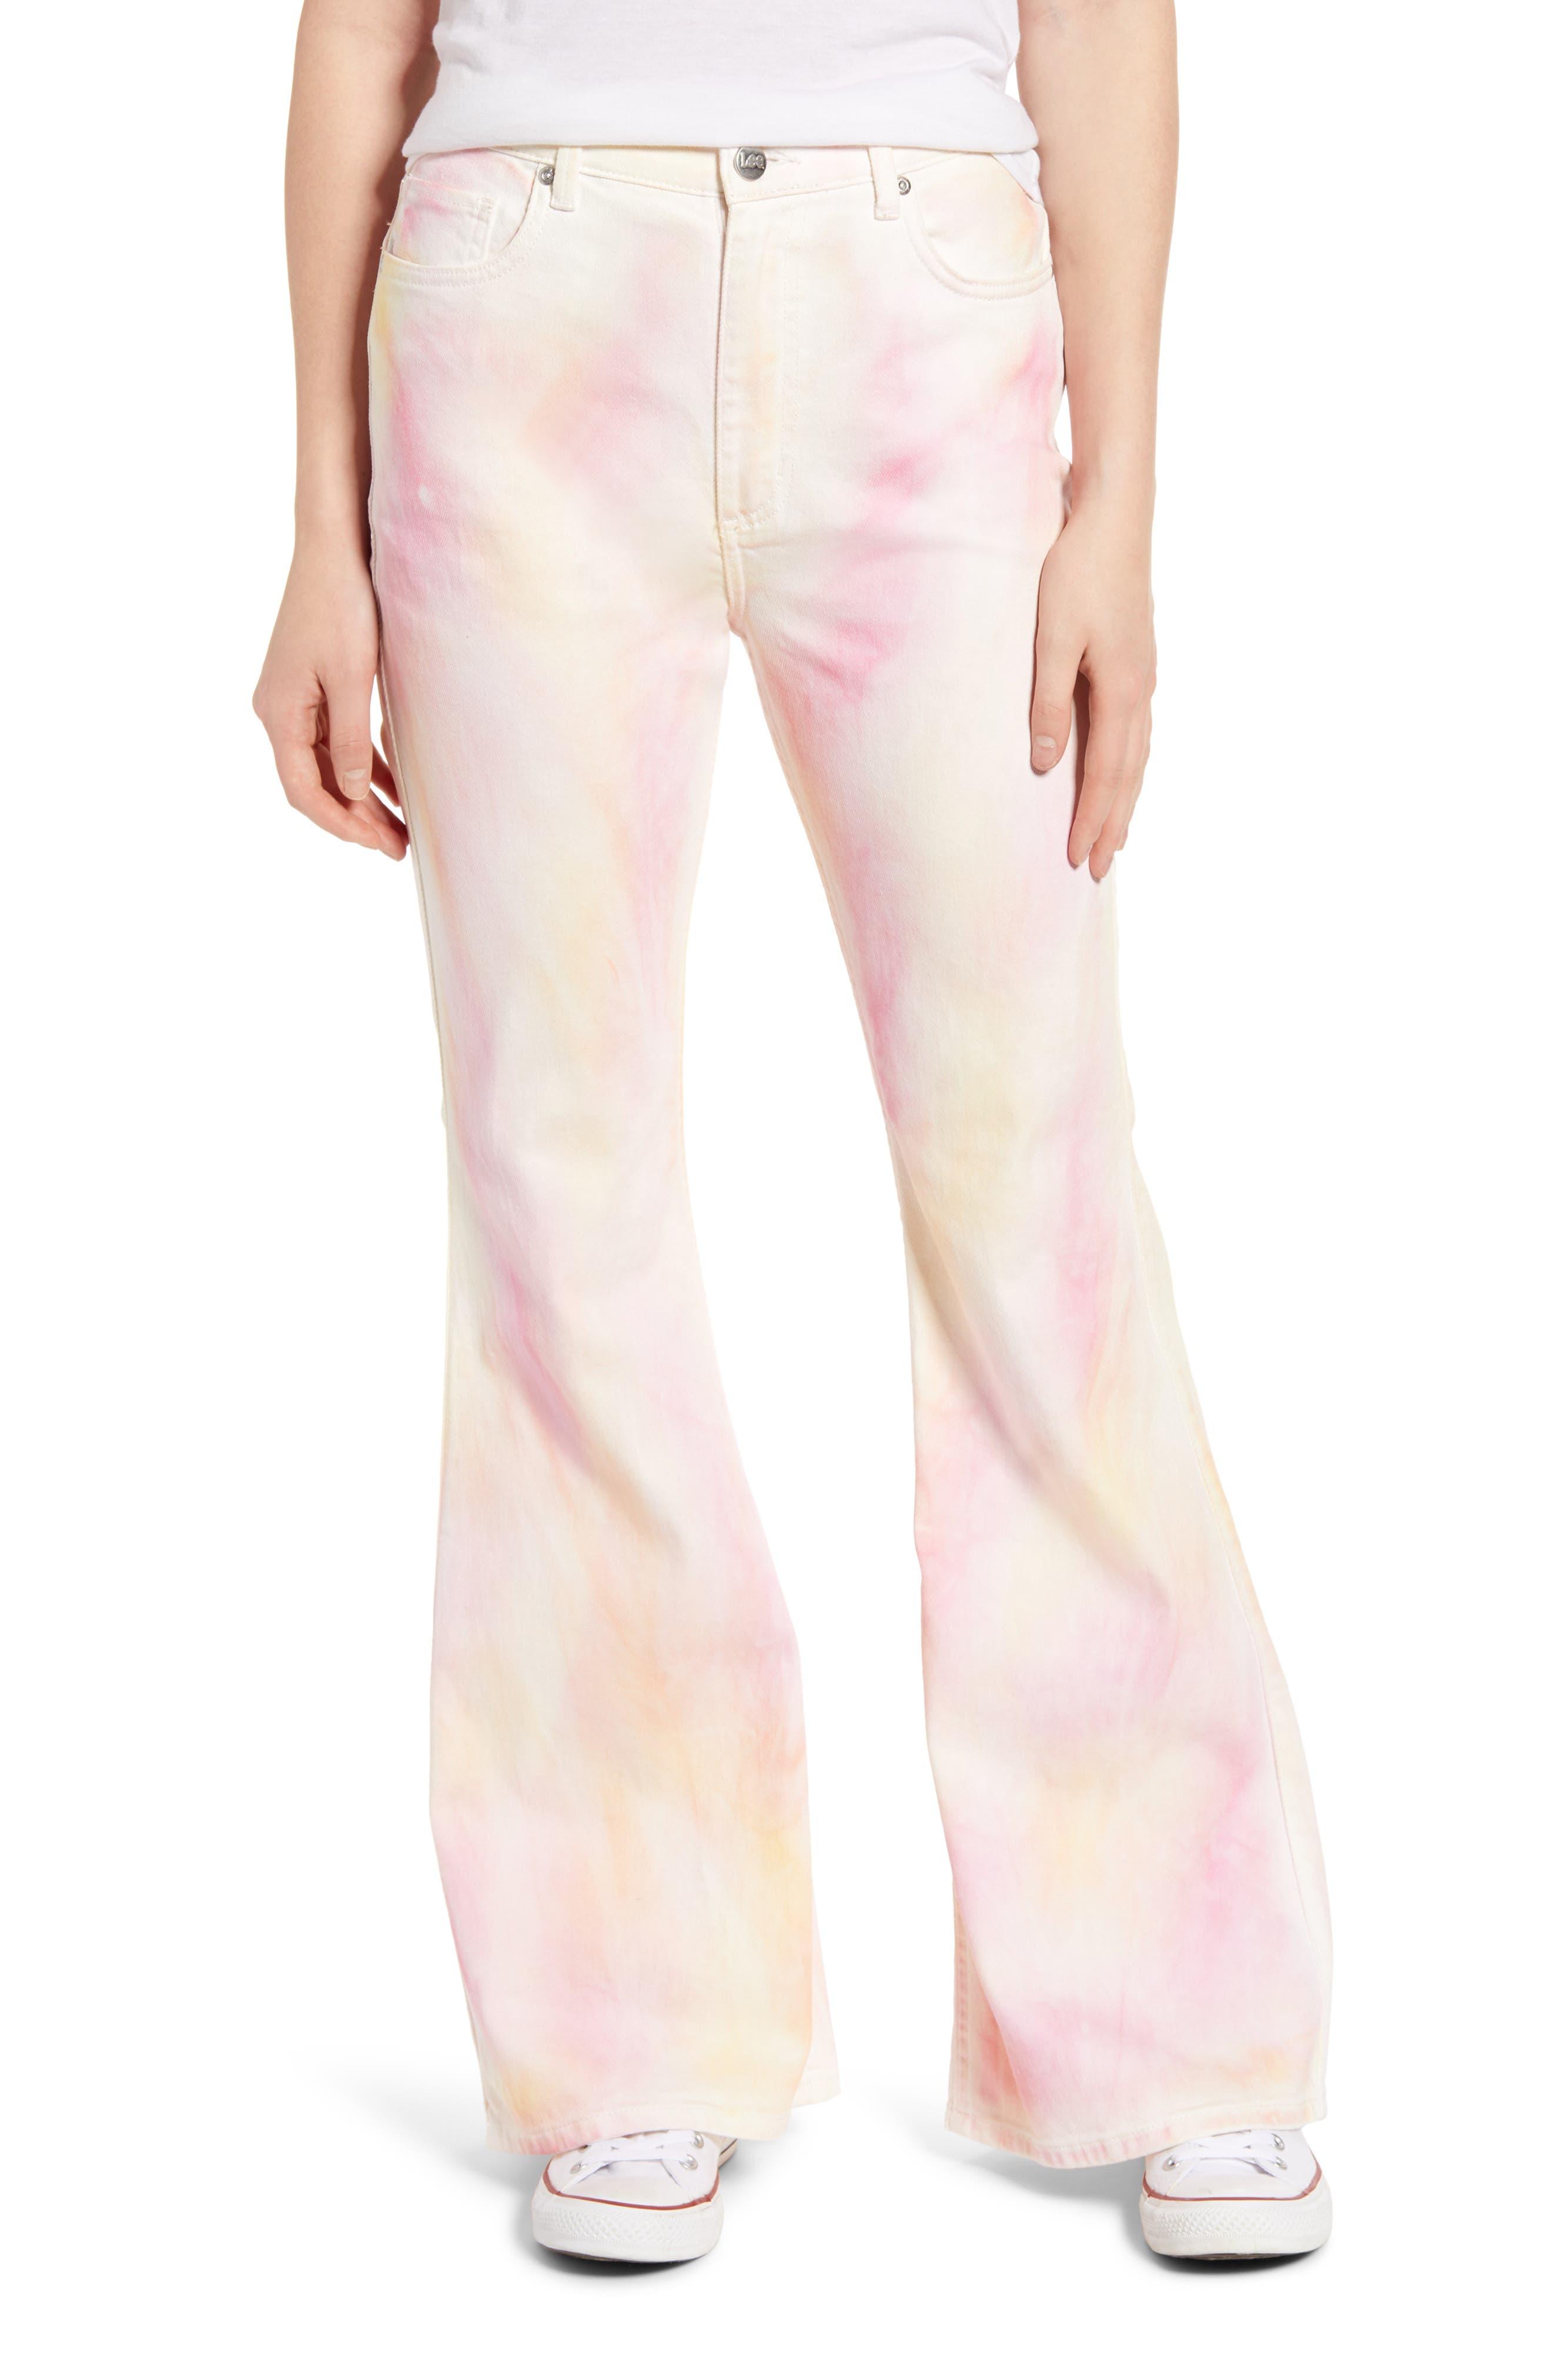 60s – 70s Pants, Jeans, Hippie, Bell Bottoms, Jumpsuits Womens Lee High Waist Flare Jeans $98.00 AT vintagedancer.com